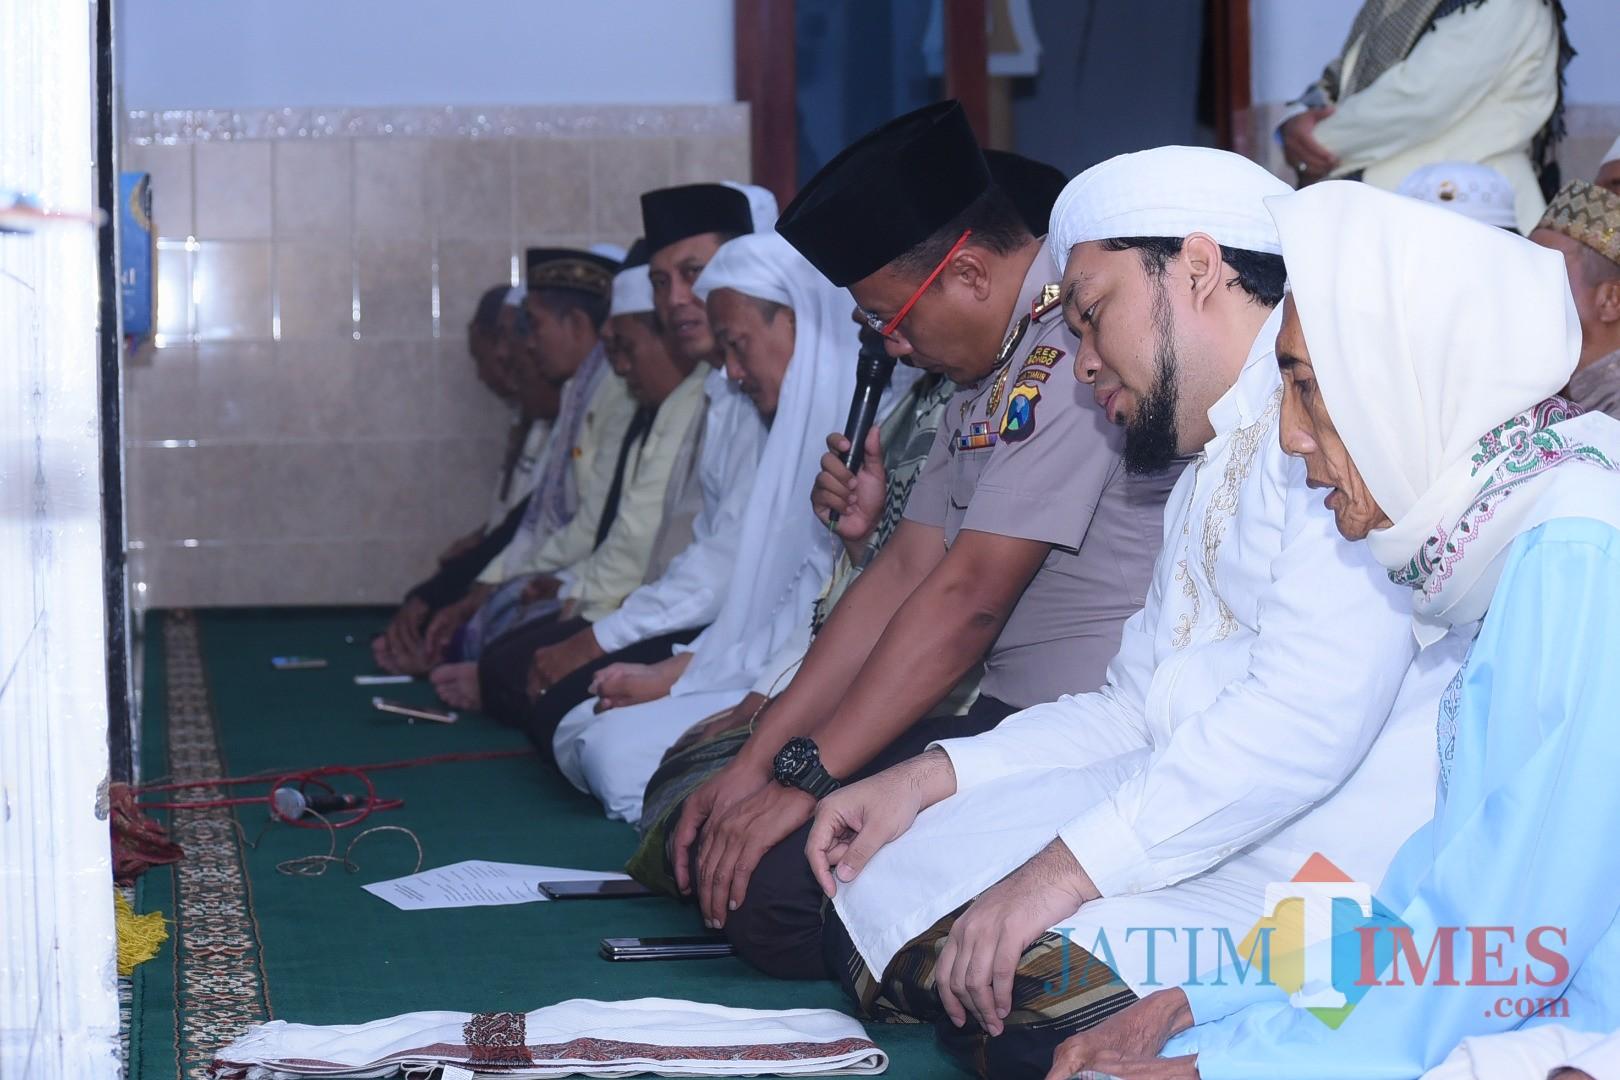 Kapolres berdampingan dengan KHR. Azaim Ibrahimy pengasuh Ponpes Salafiyah Safiyah Sukorejo saat melaksanakan salat itikaf (Foto Sony Haryono / SitubondoTIMES)